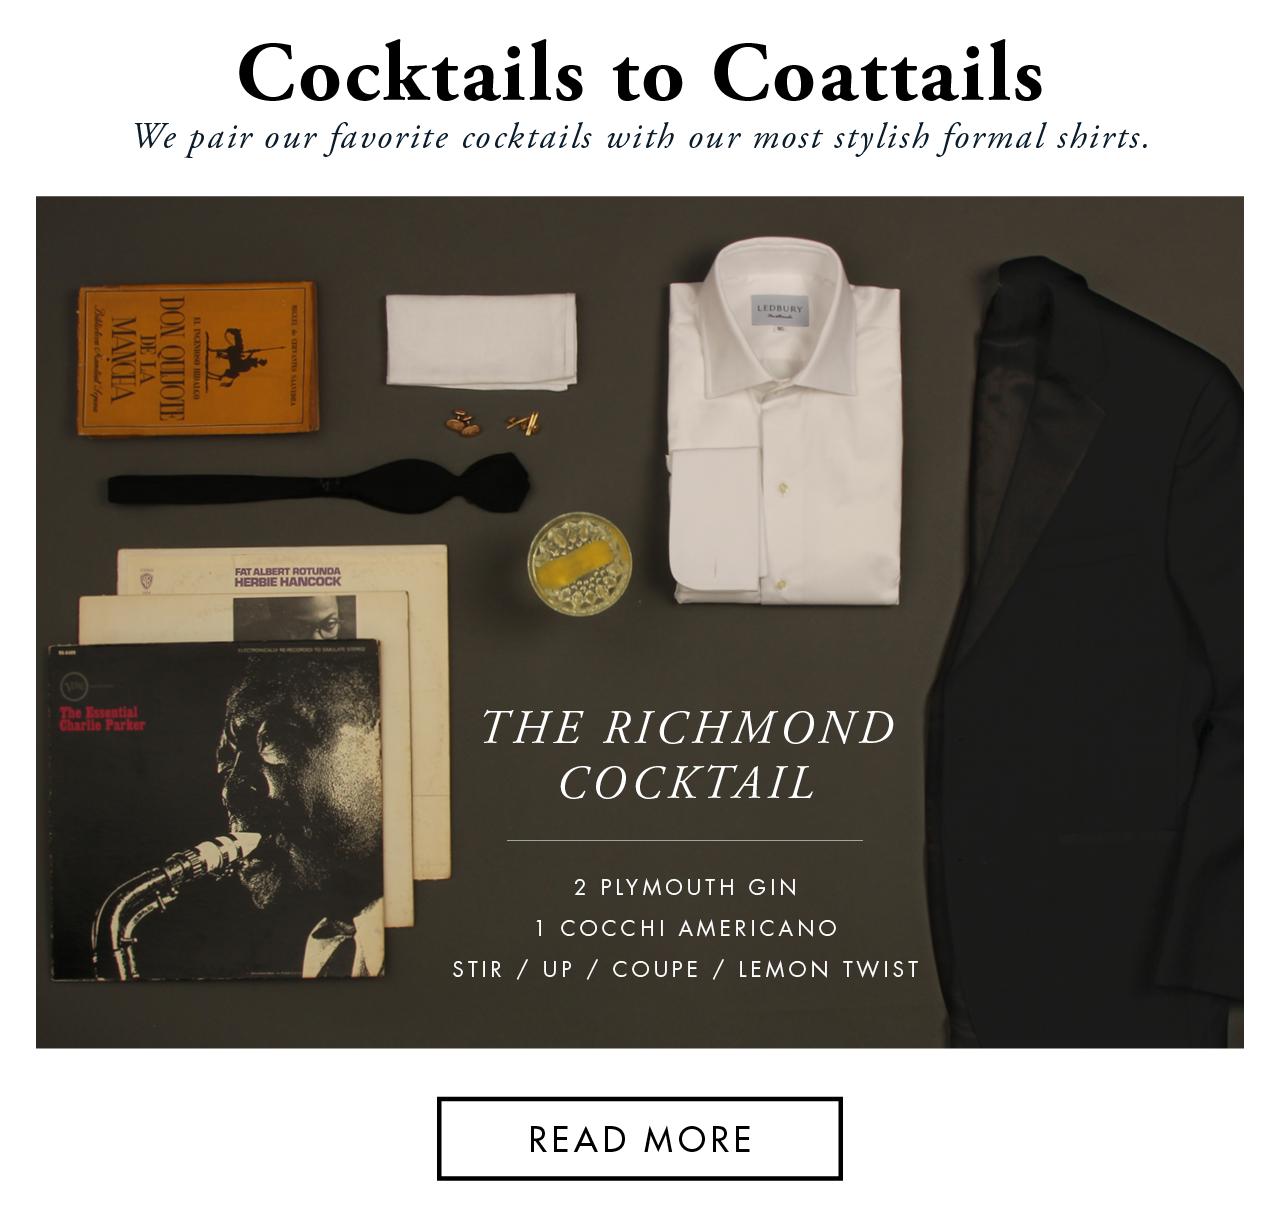 Cocktails to Coattails